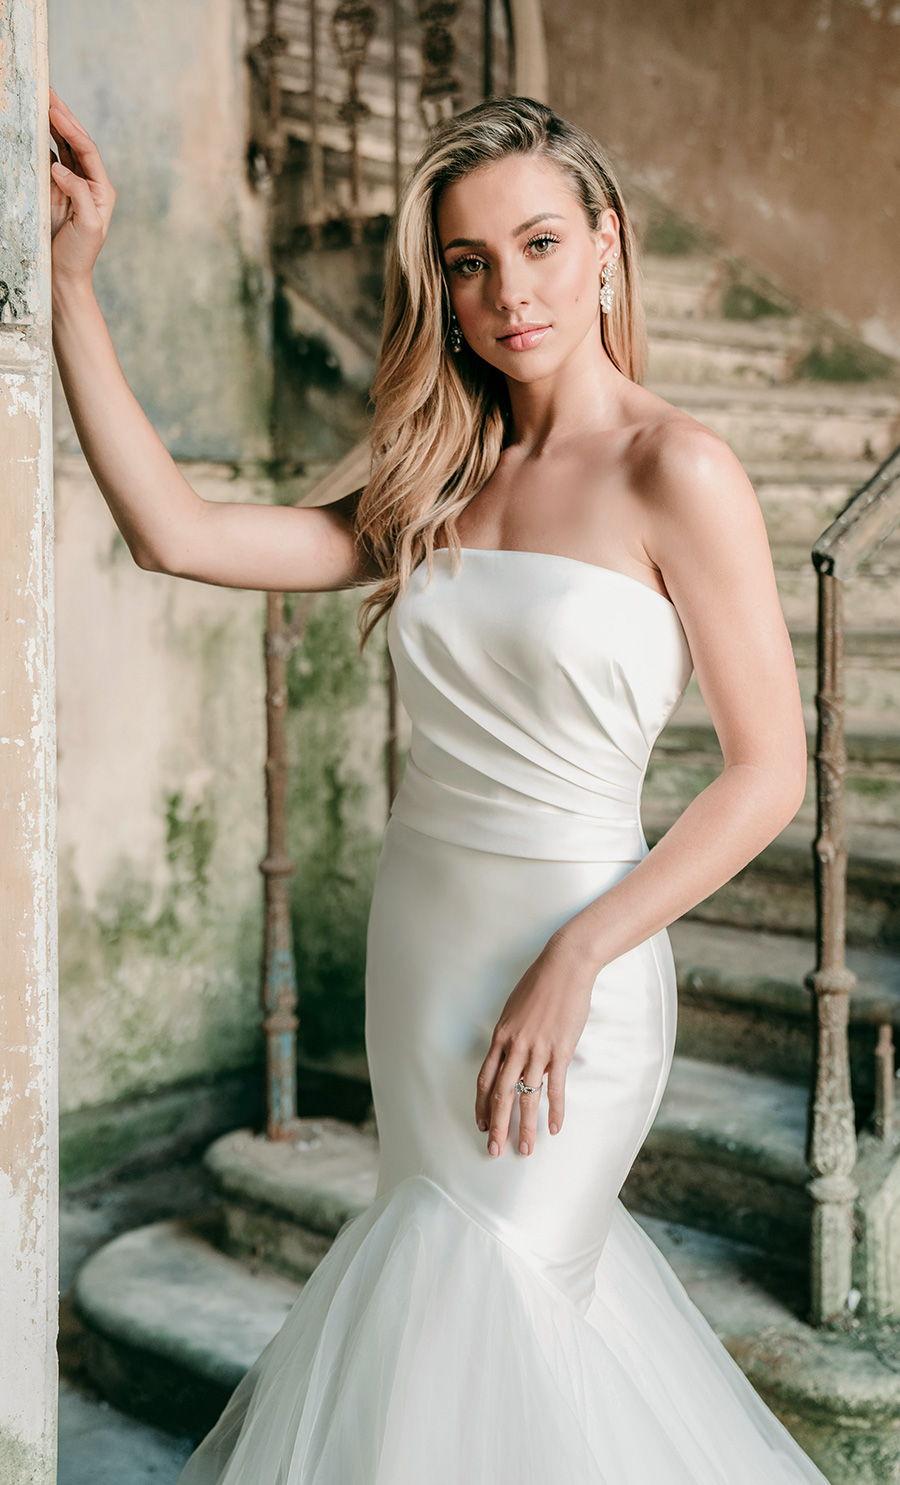 madison james spring 2020 bridal strapless straight across neckline simple minimalist classic elegant mermaid wedding dress mid back chapel train (mj624) zv